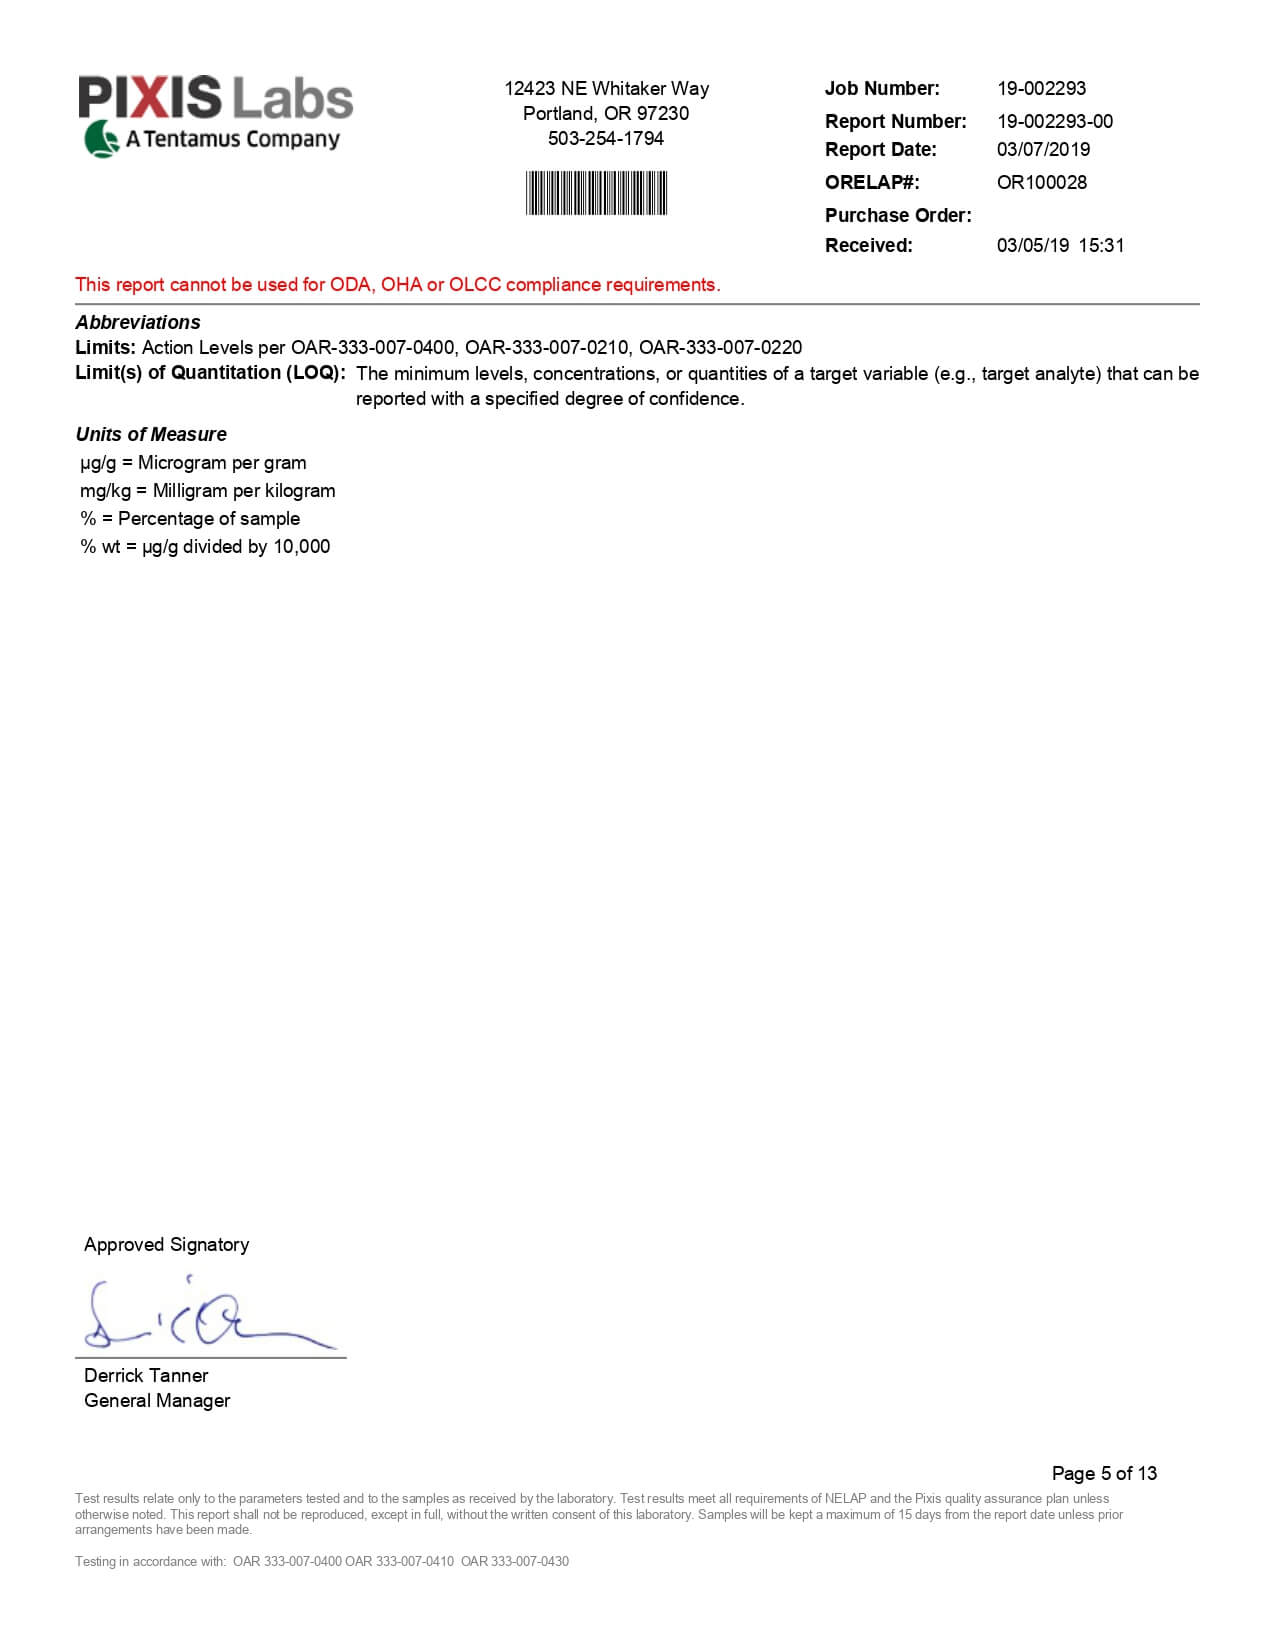 Select CBD Capsule Recover 33.3mg Lab Report